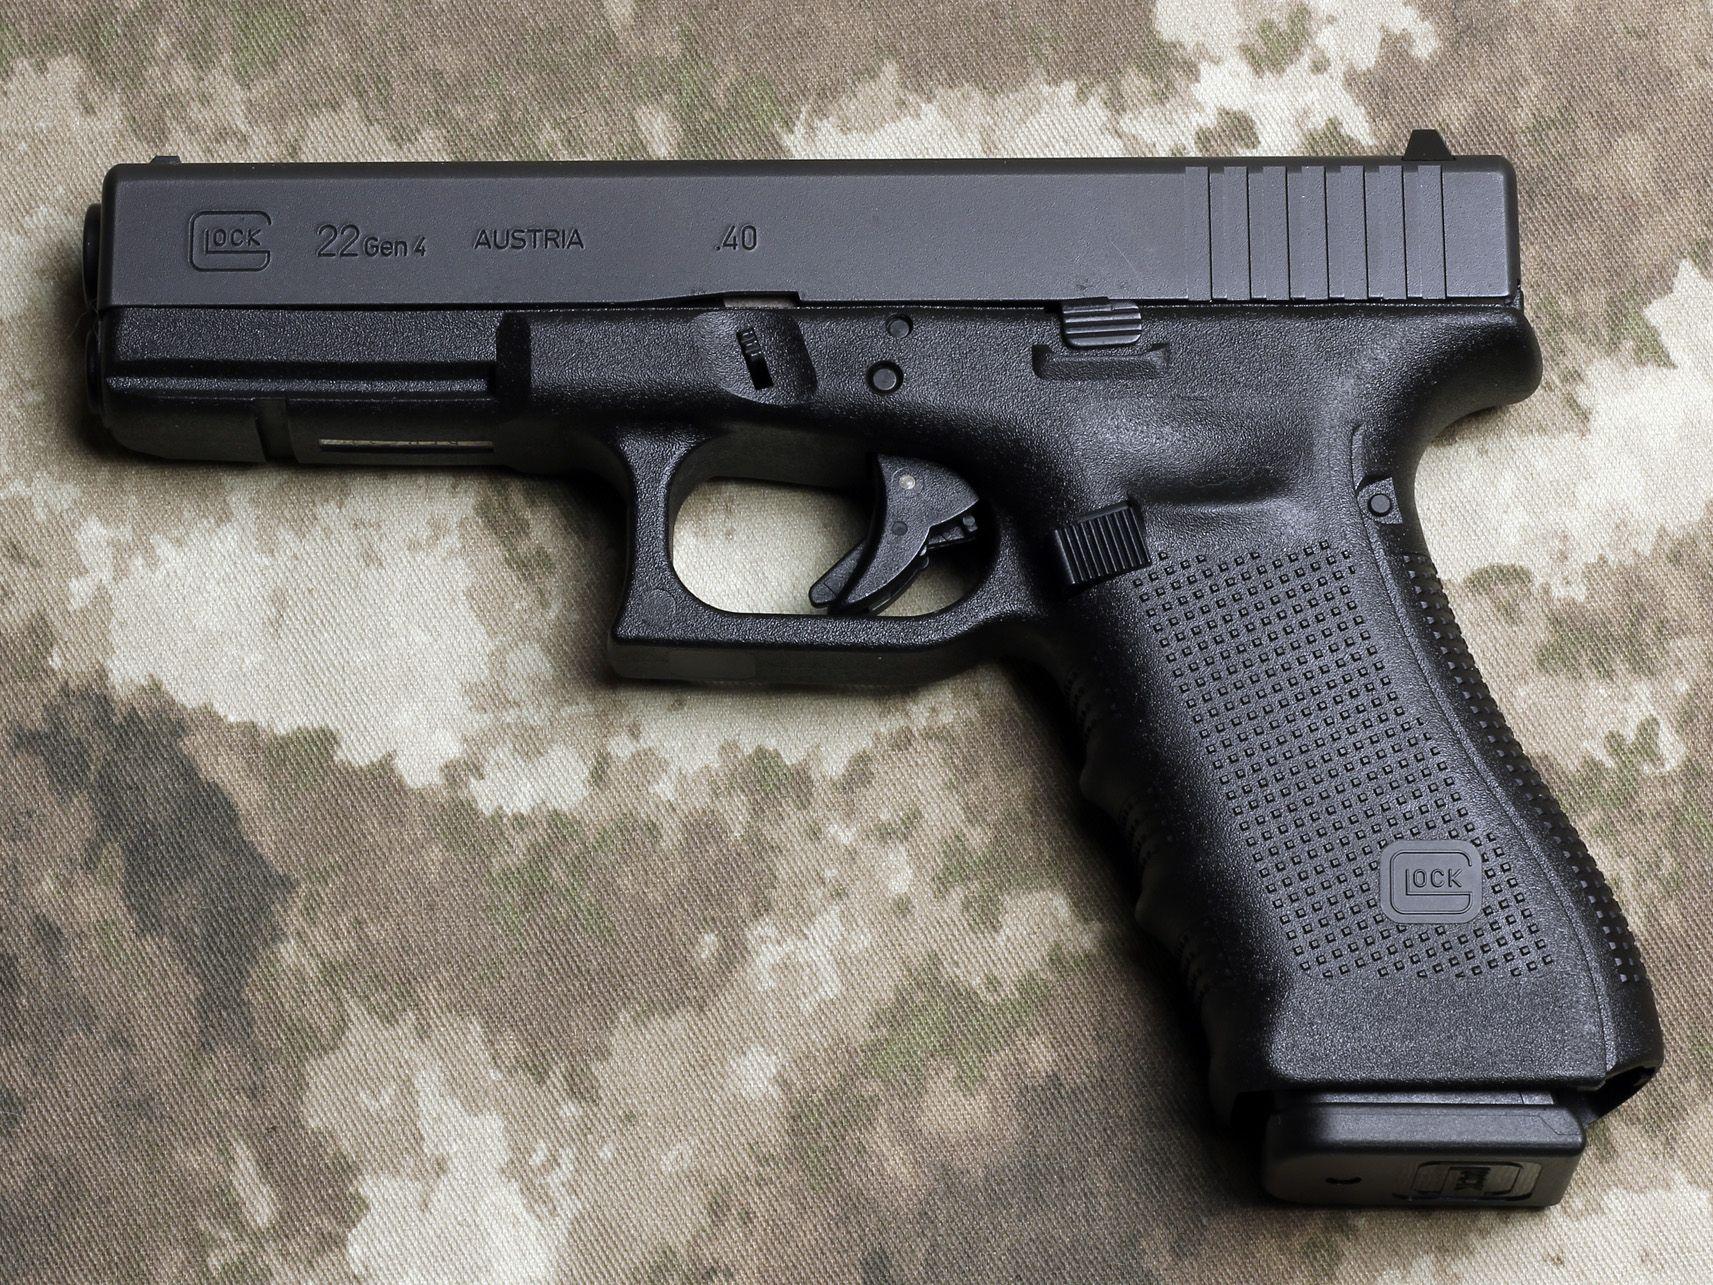 Glock 22 40 Caliber Generation 4 Has An Improved Modular Back